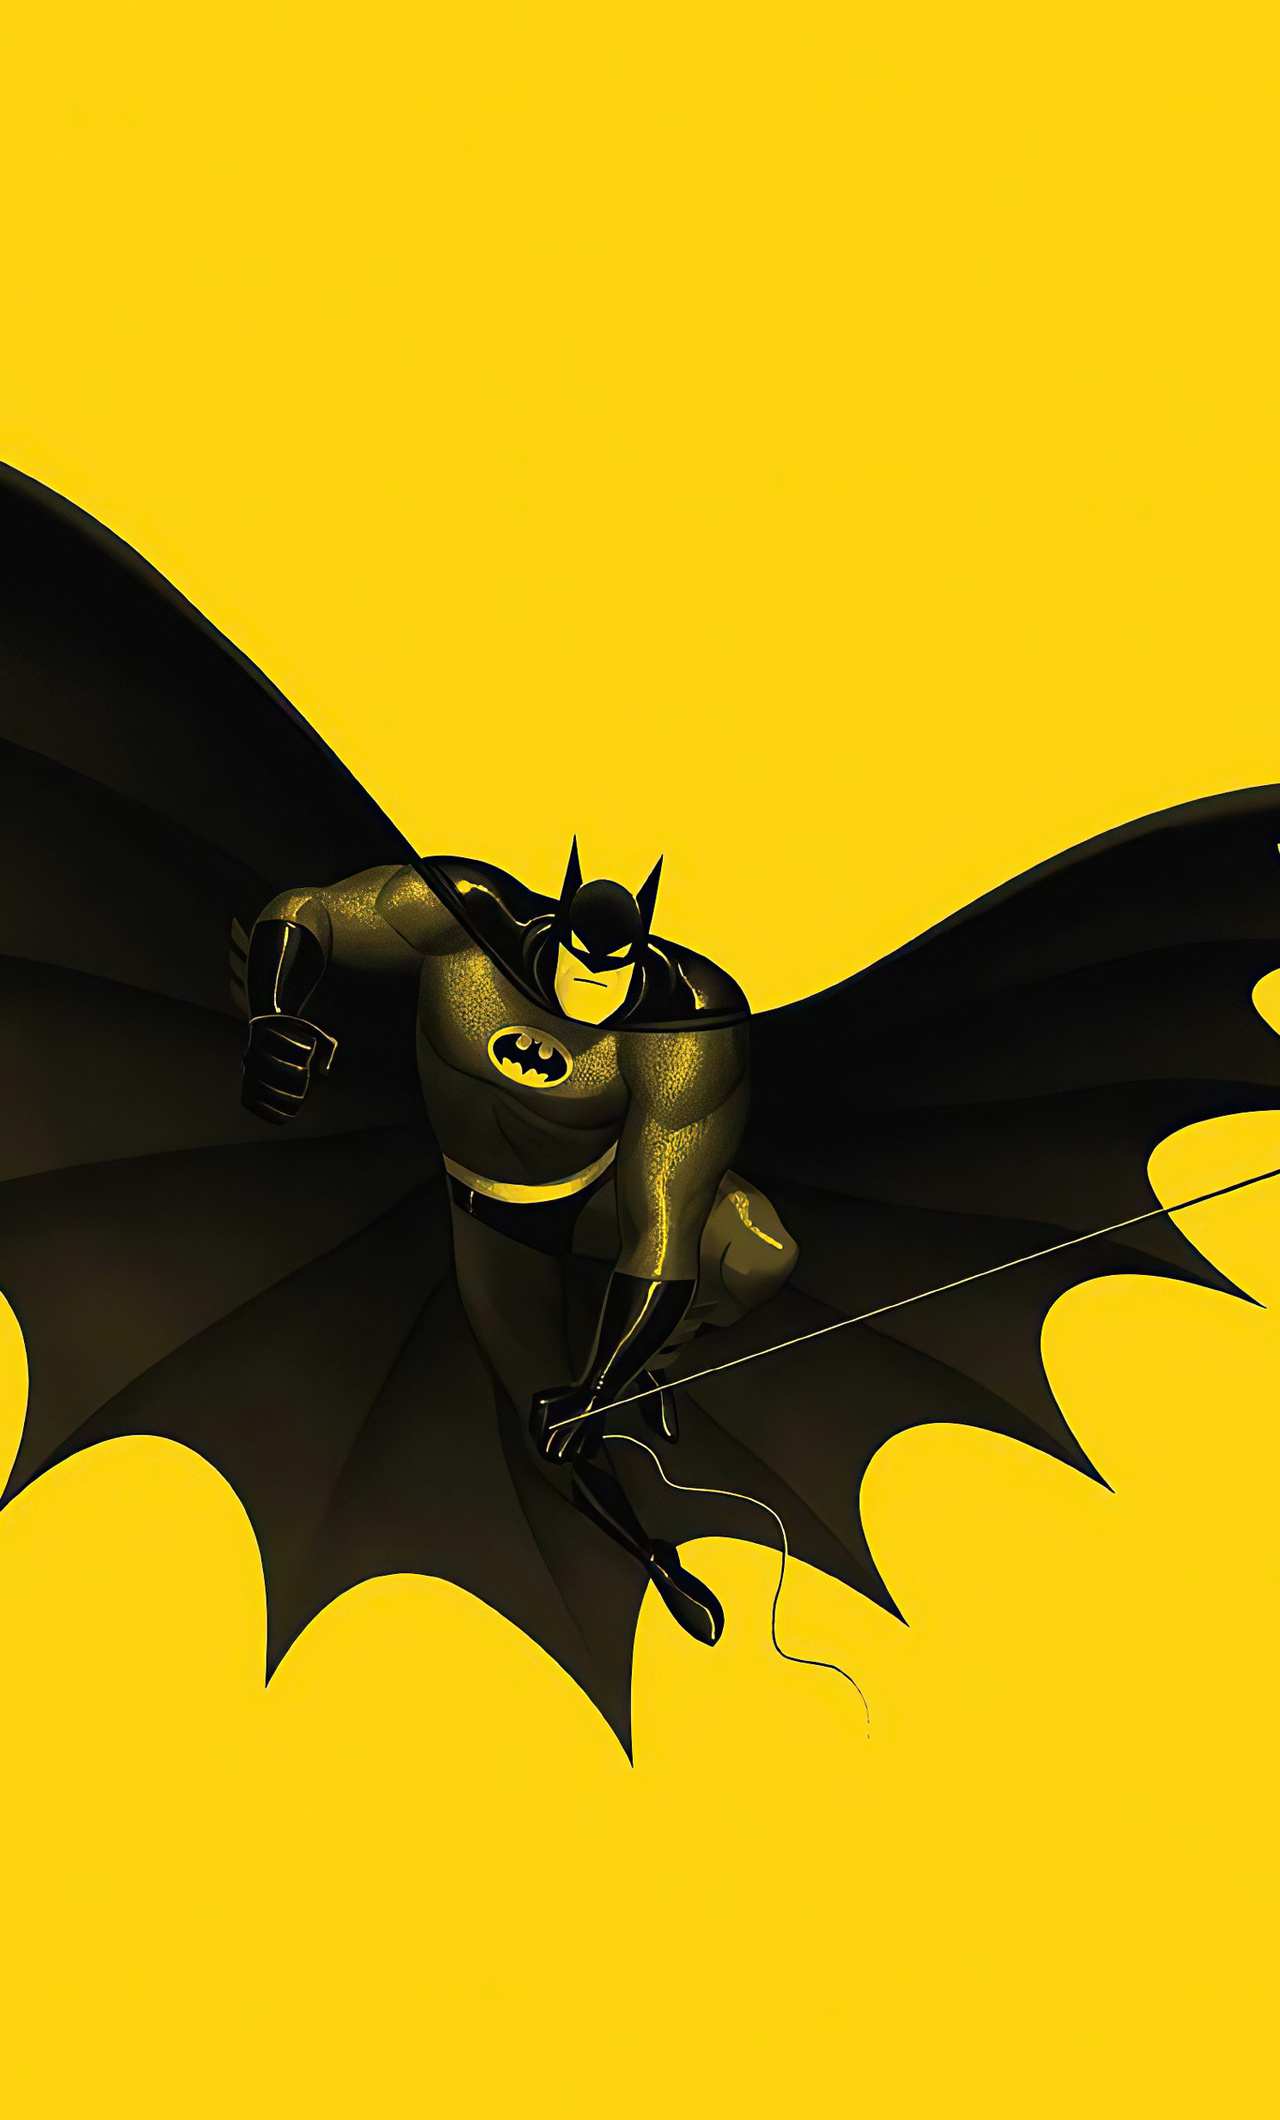 batman yellow 4k wj